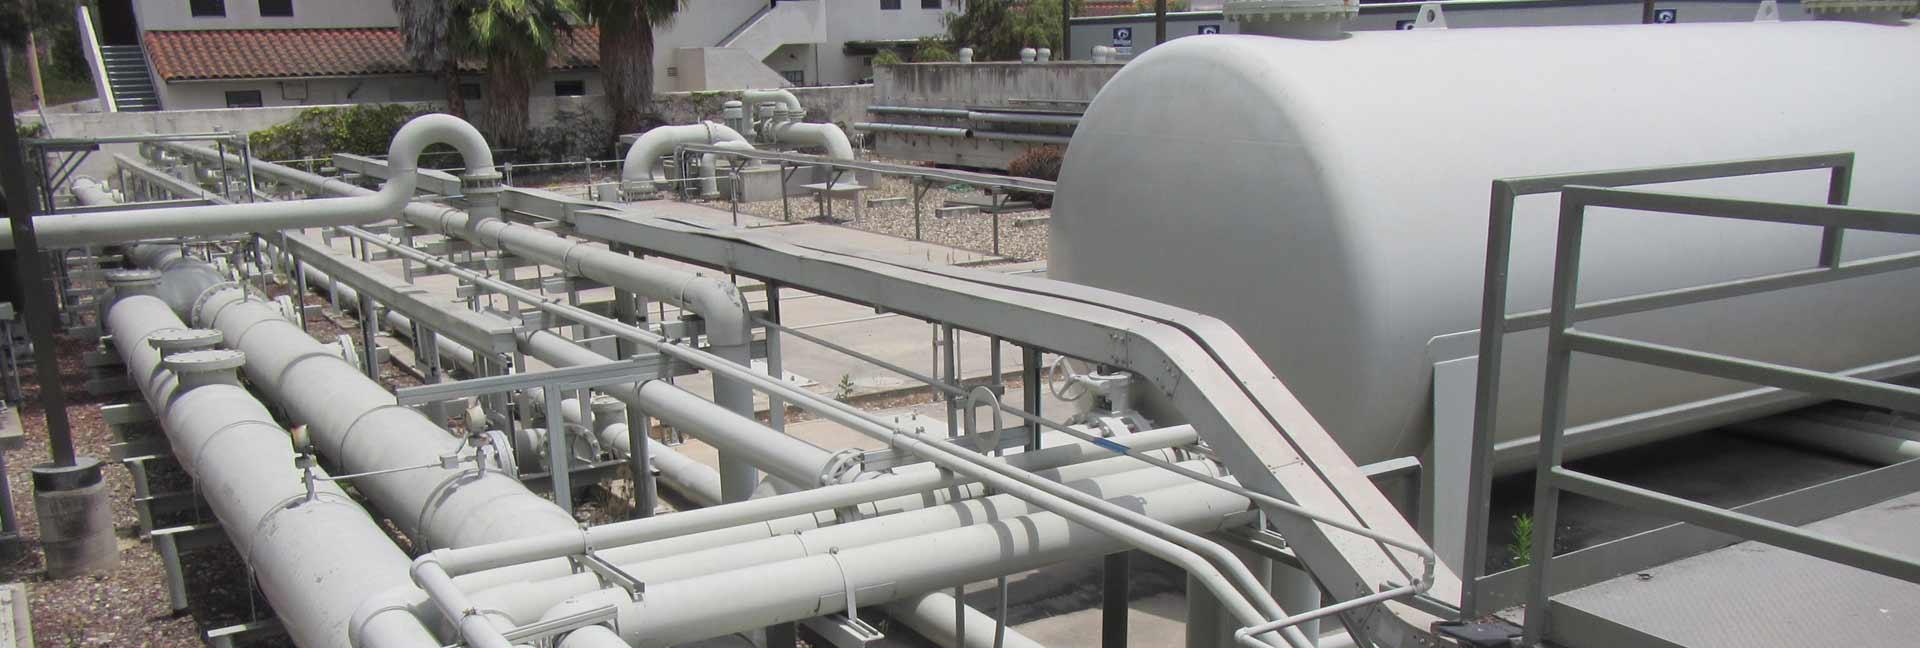 Santa Barbara desalination plant.